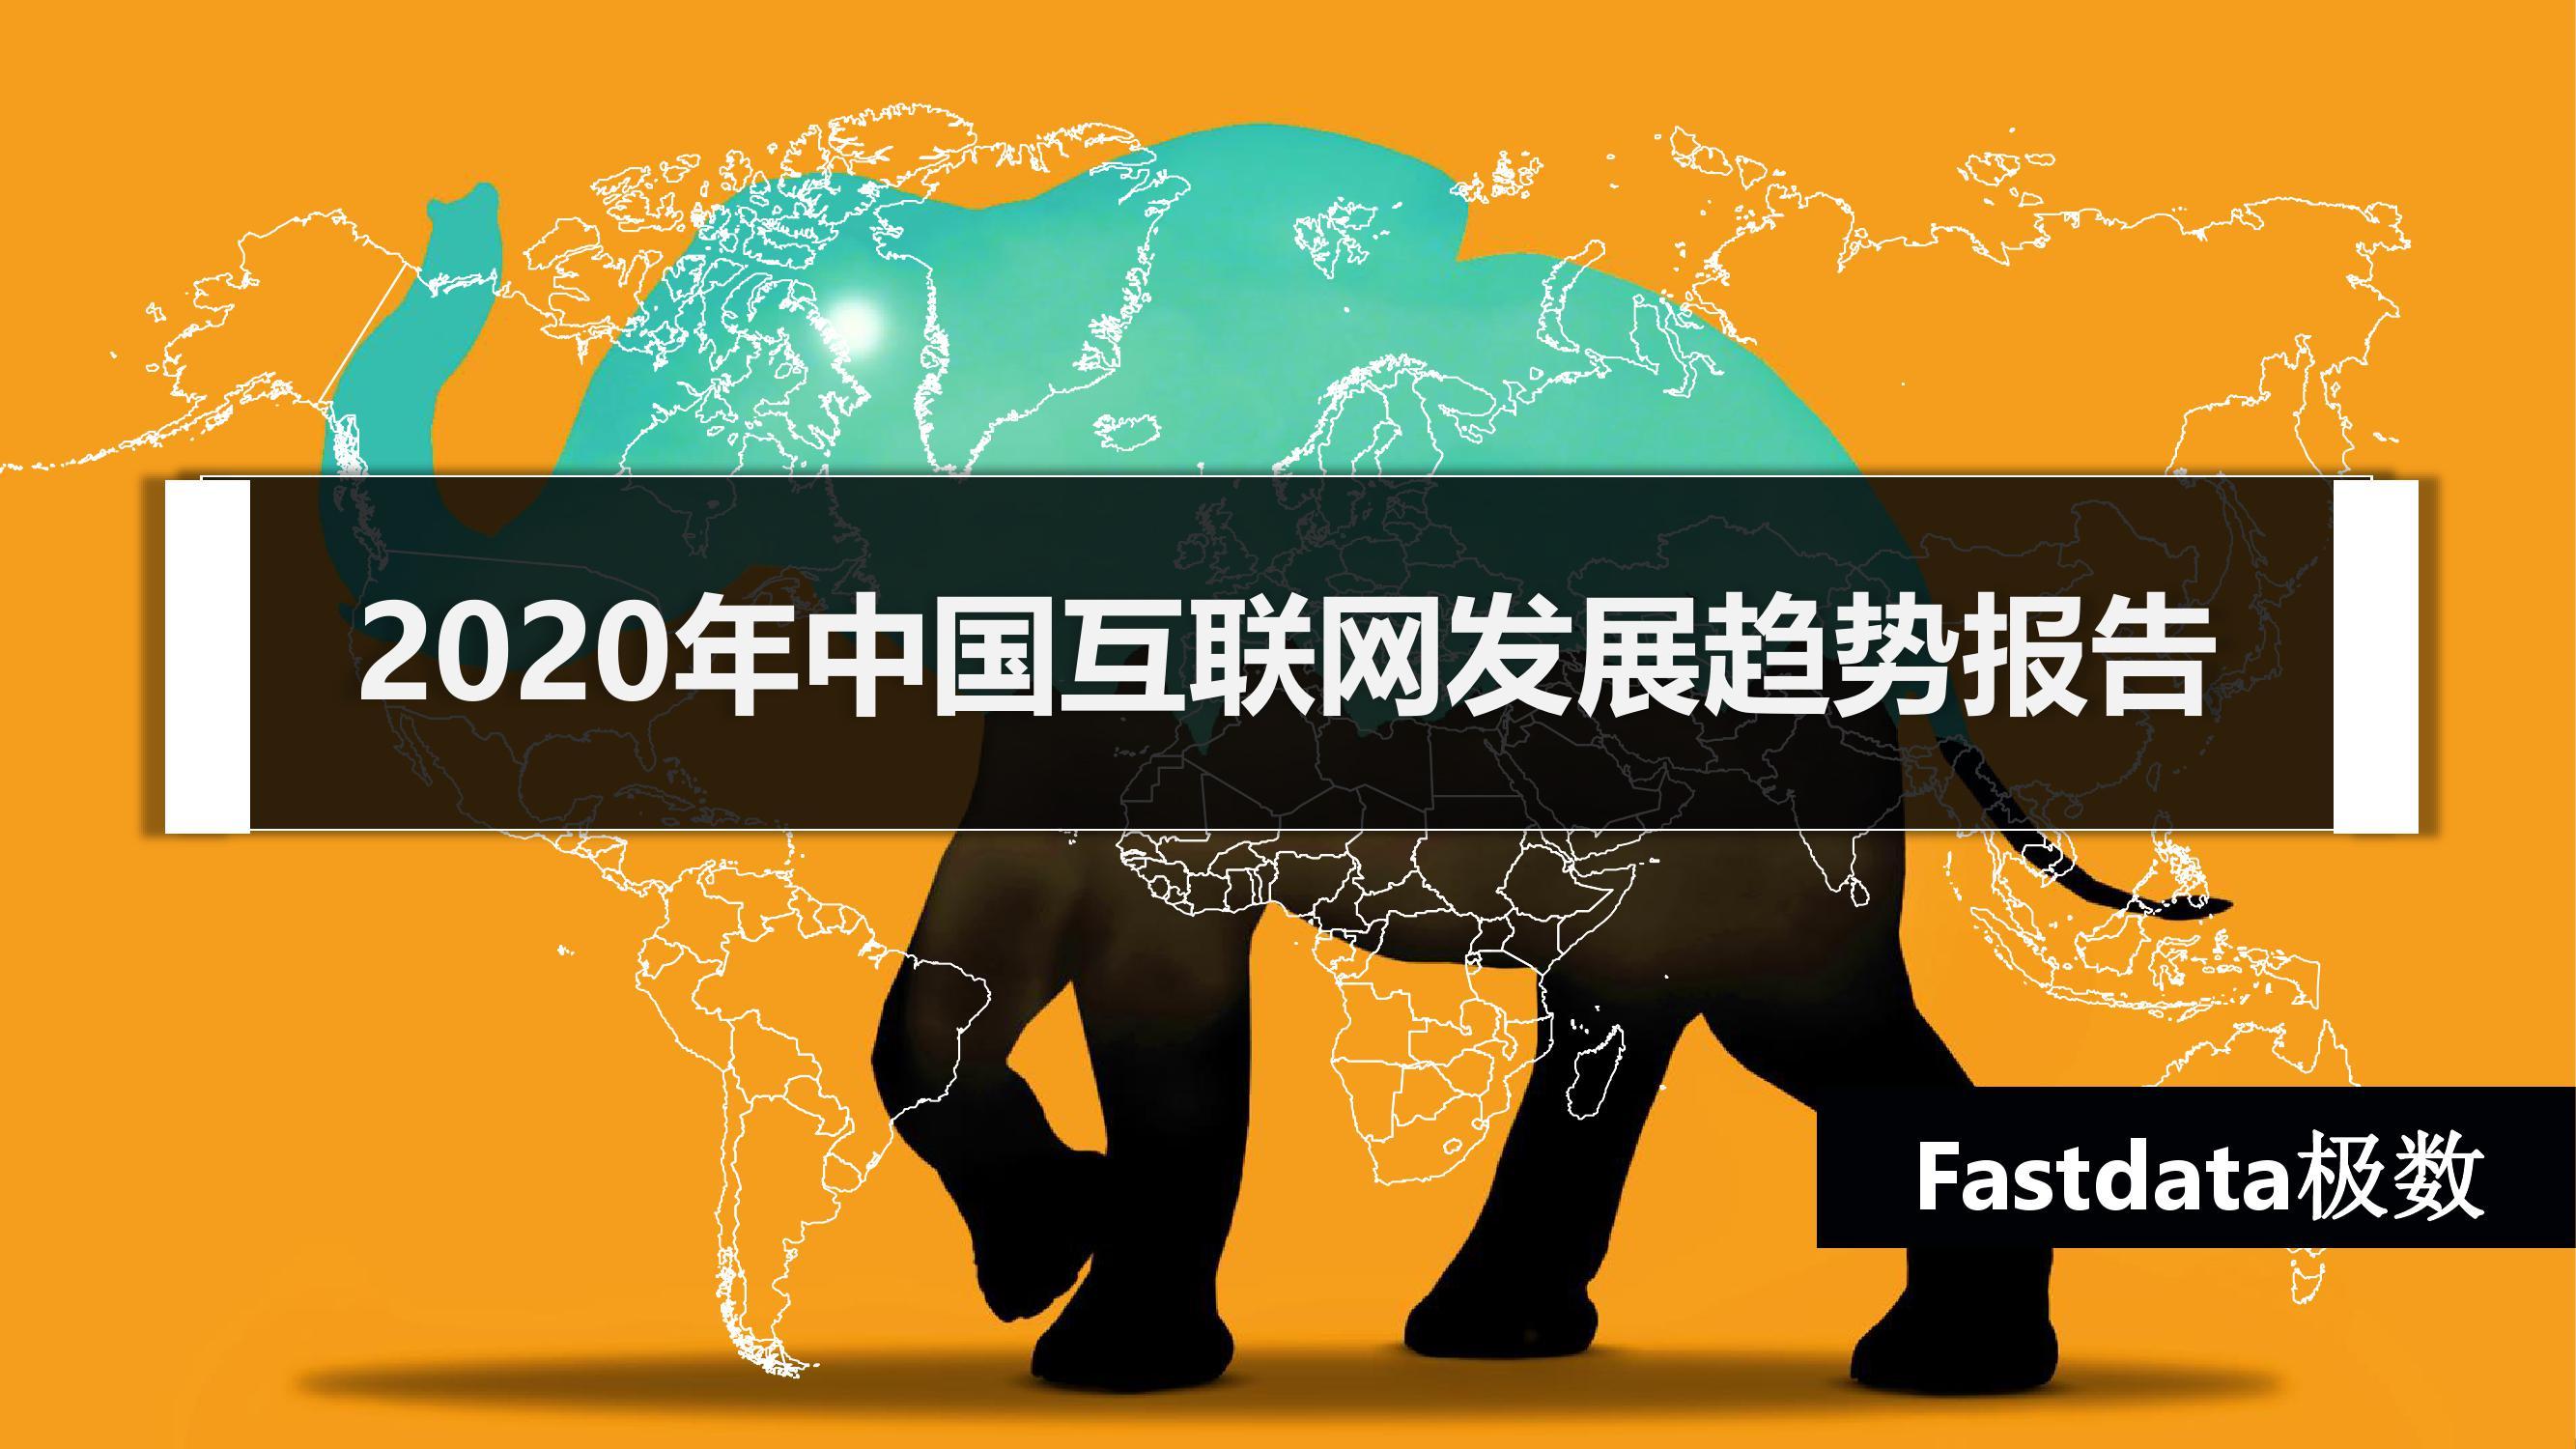 Fastdata极数:2020年中国互联网发展趋势报告